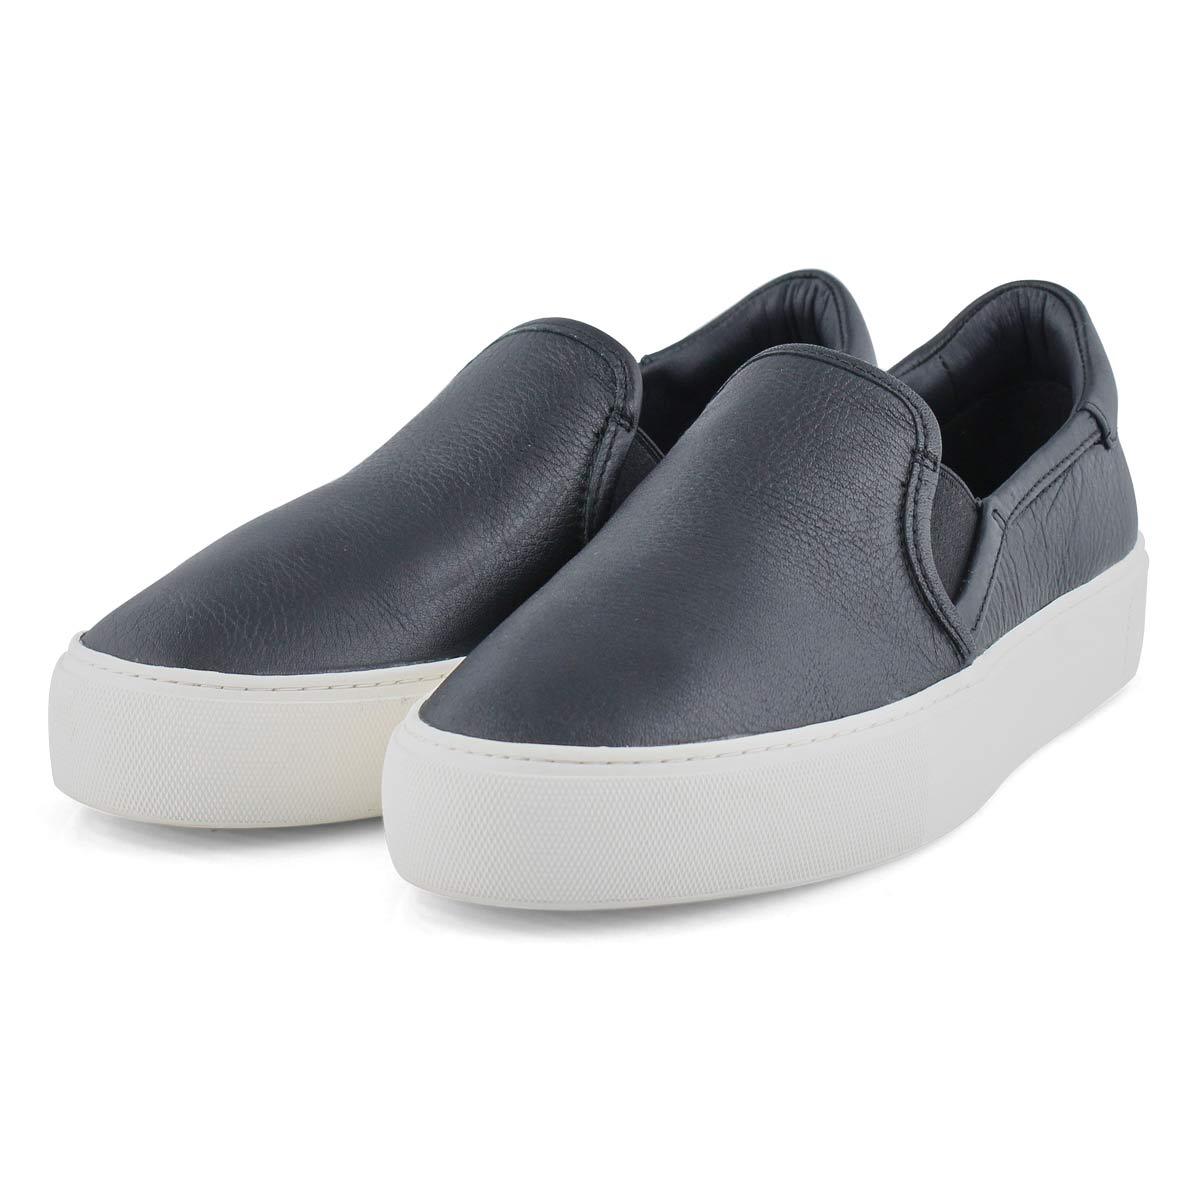 Women's Jass Slip On Shoe - Black